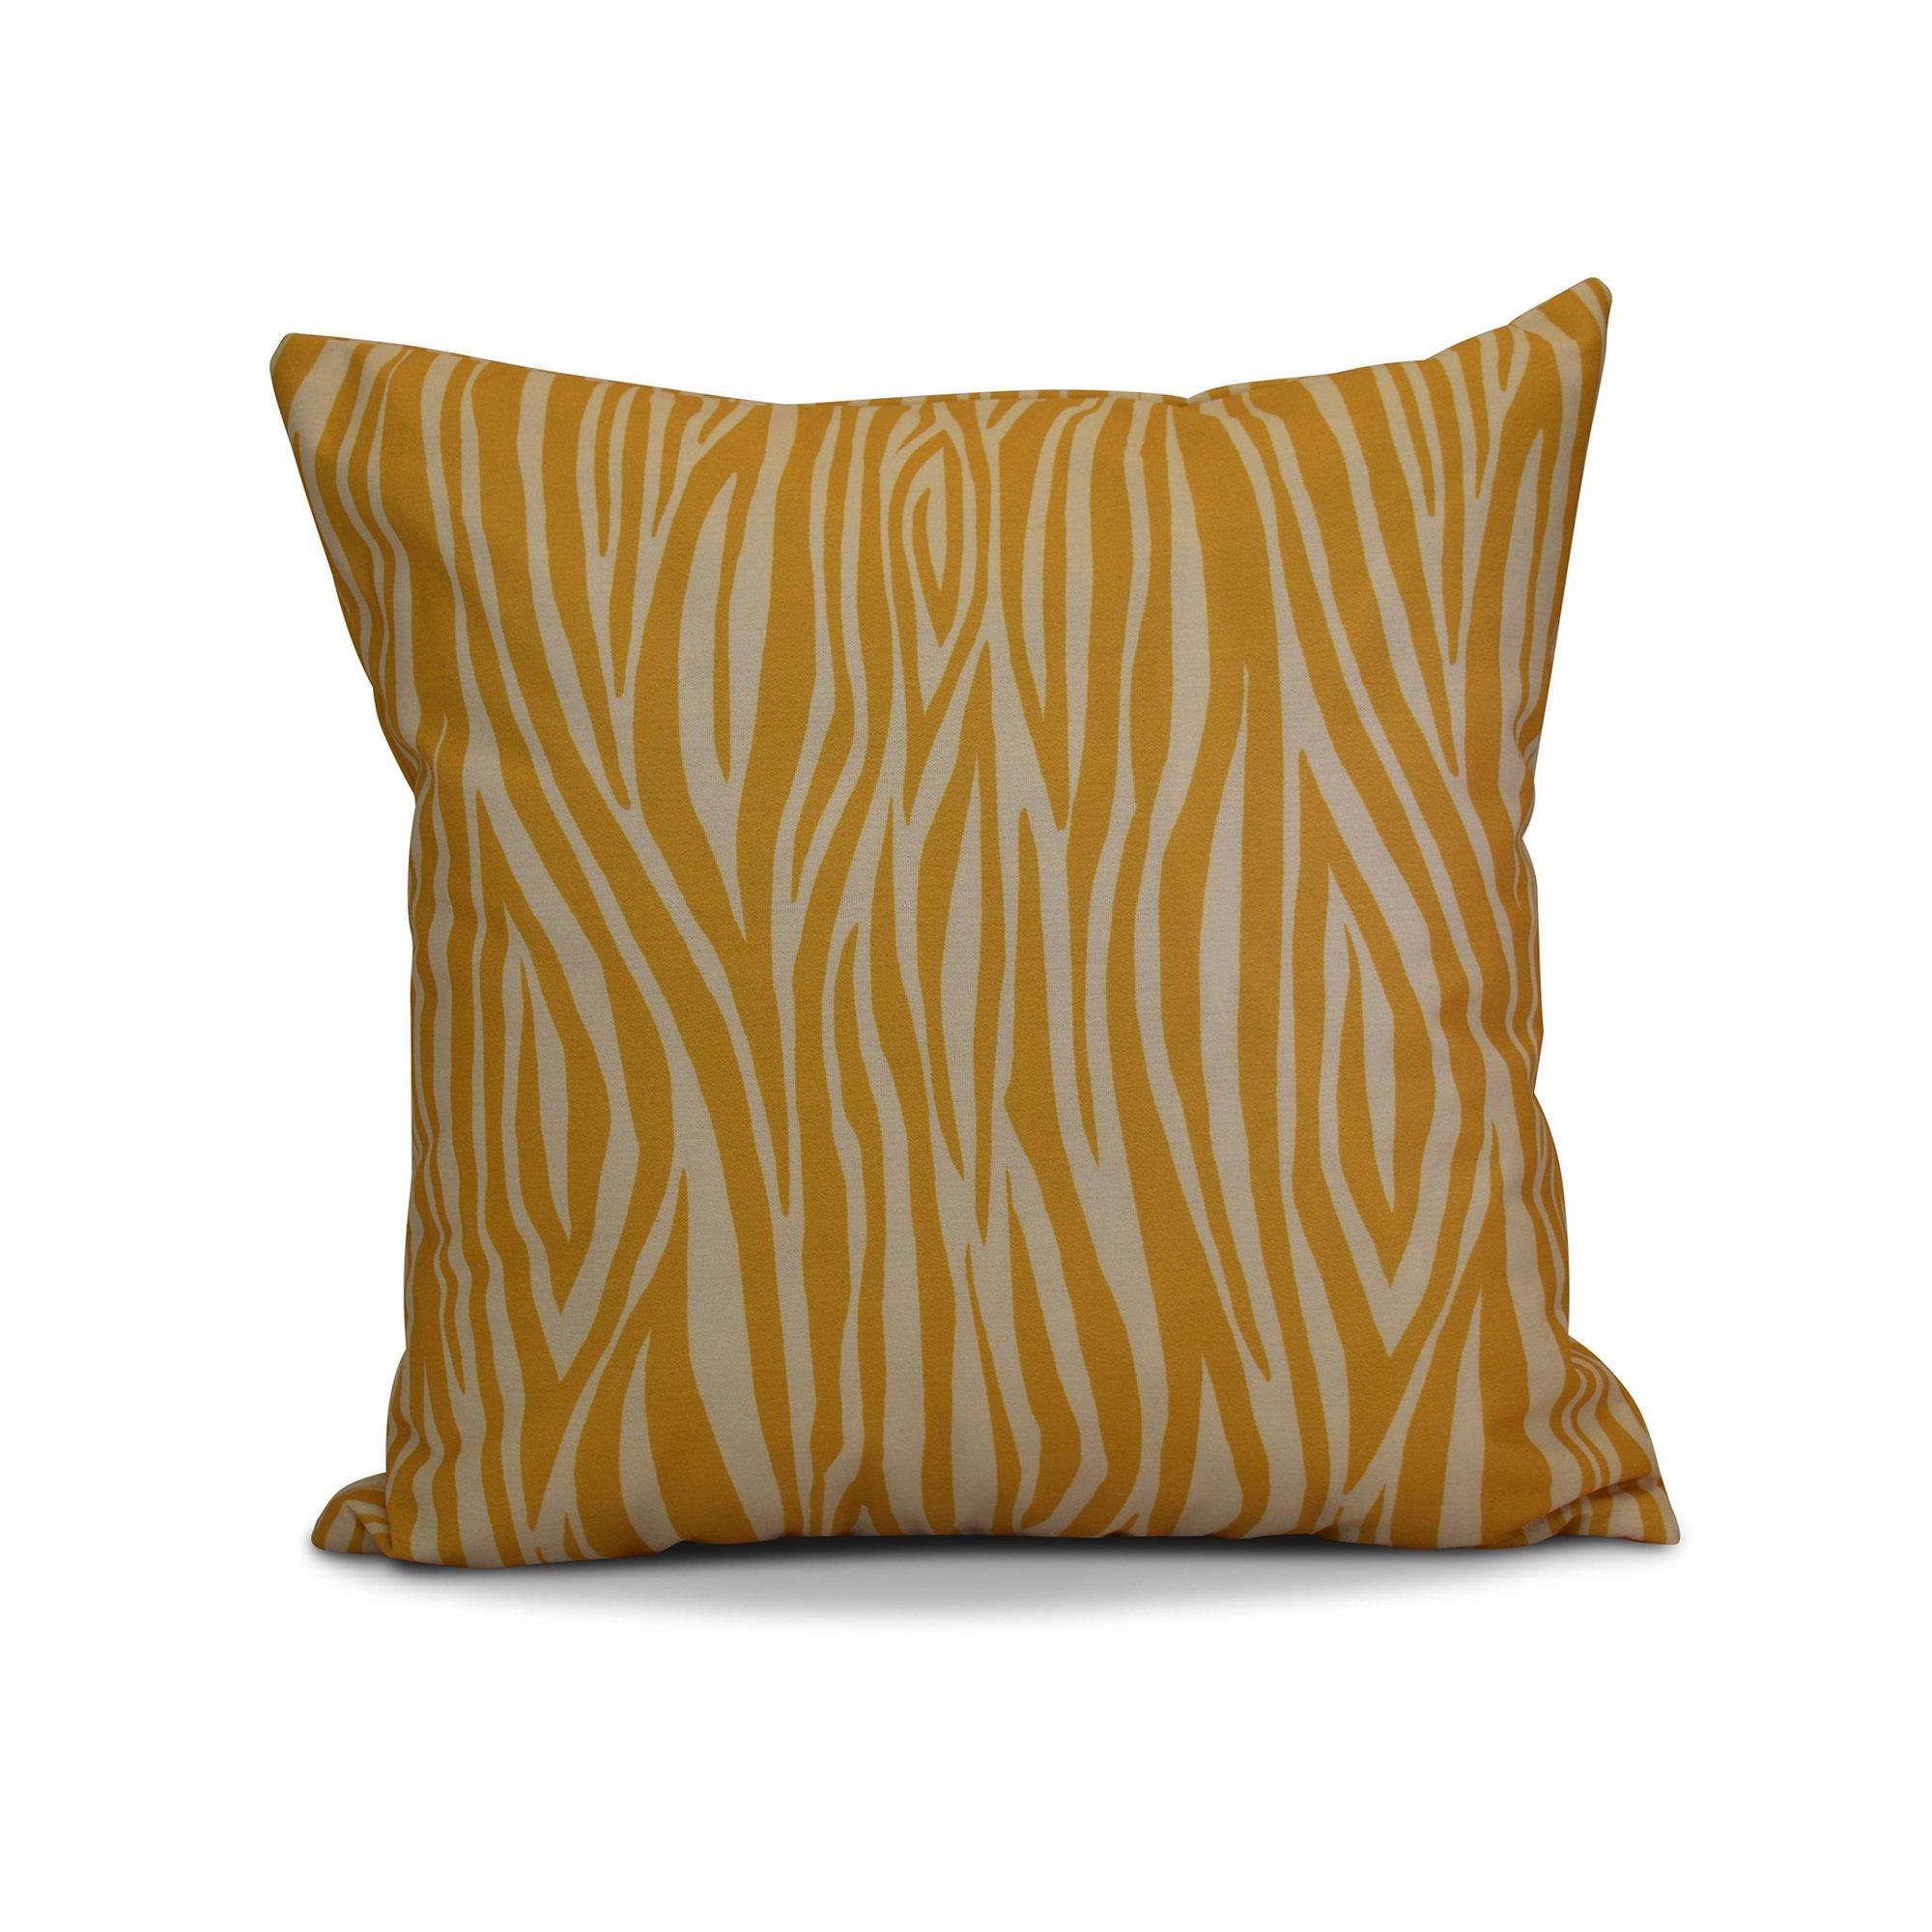 E by design 20 x 20-inch, Wood Stripe, Geometric Print Pillow, Gold